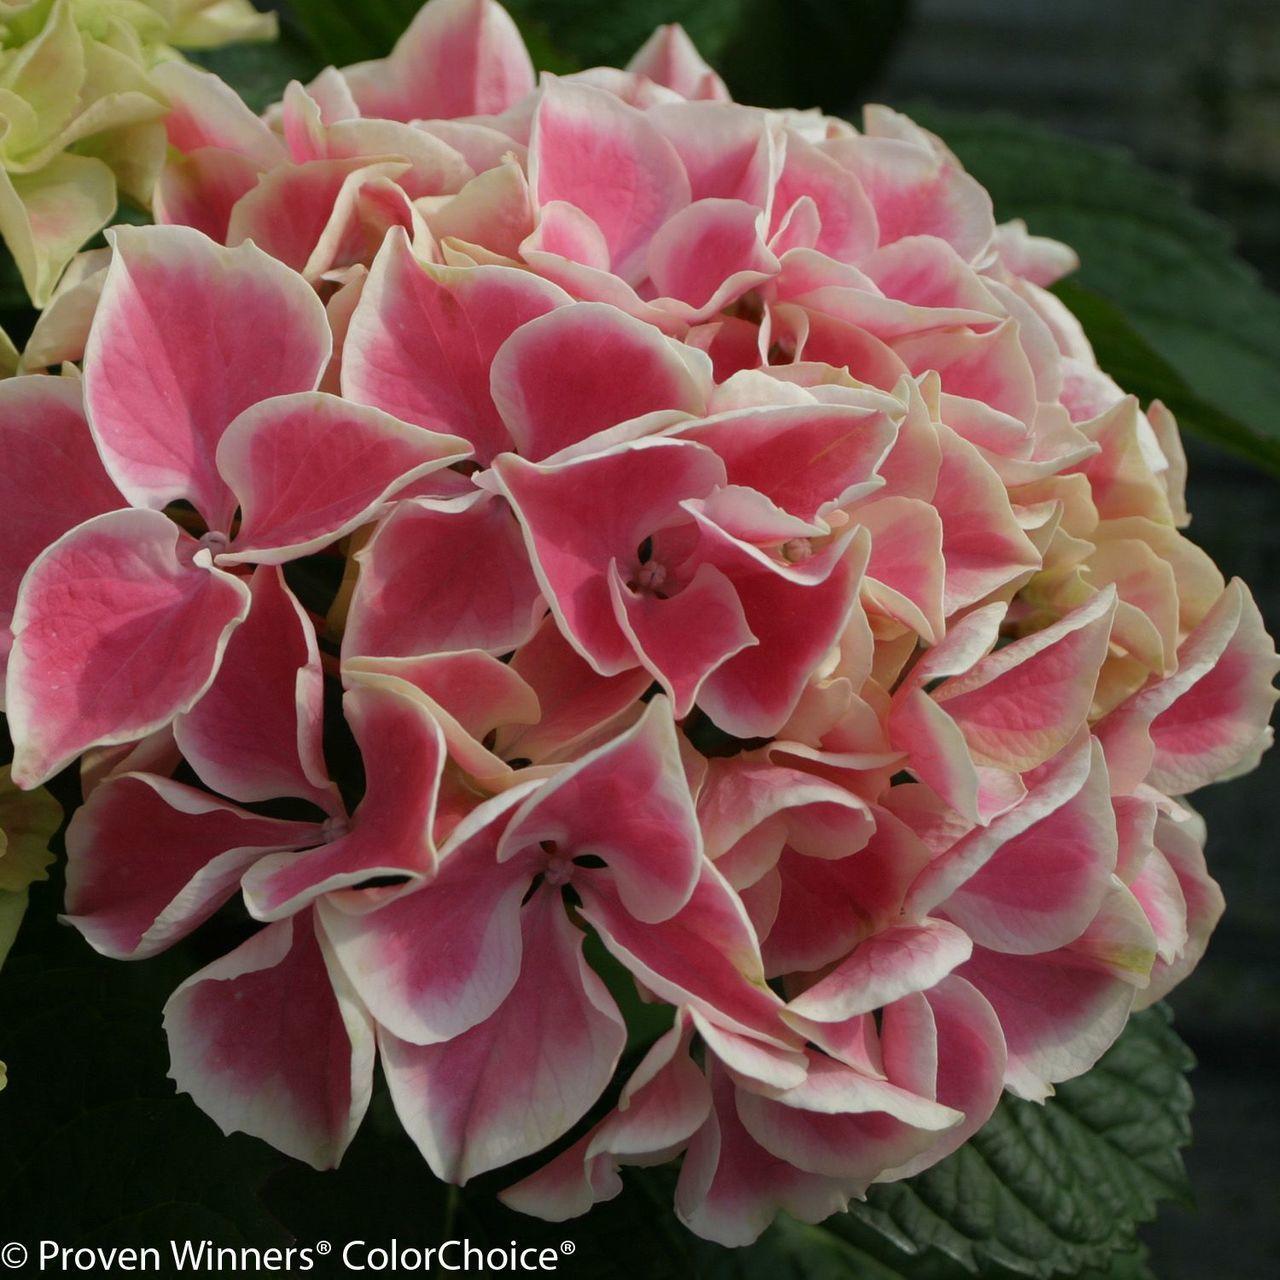 Pink Edgy Hearts Hydrangea Variegated Flower Hydrangea Macrophylla Hydrangea Flower Planting Hydrangeas